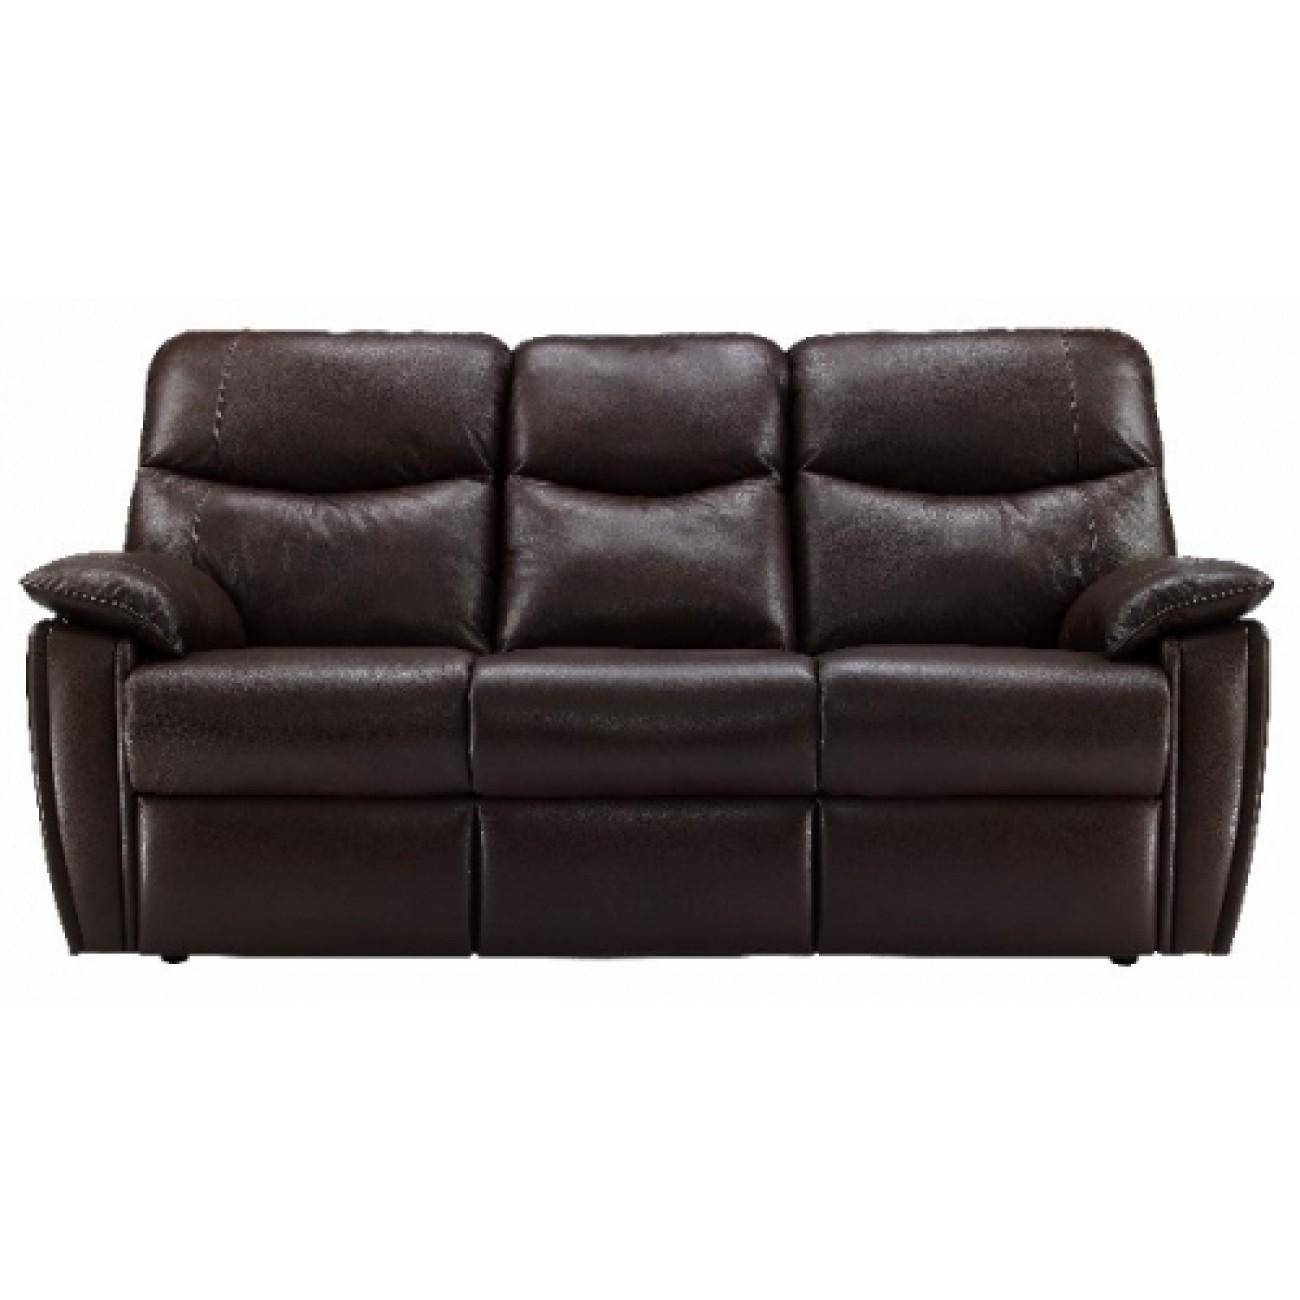 Sofa Ideas: Sealy Sofas (Explore #4 Of 20 Photos) for Sealy Sofas (Image 14 of 15)